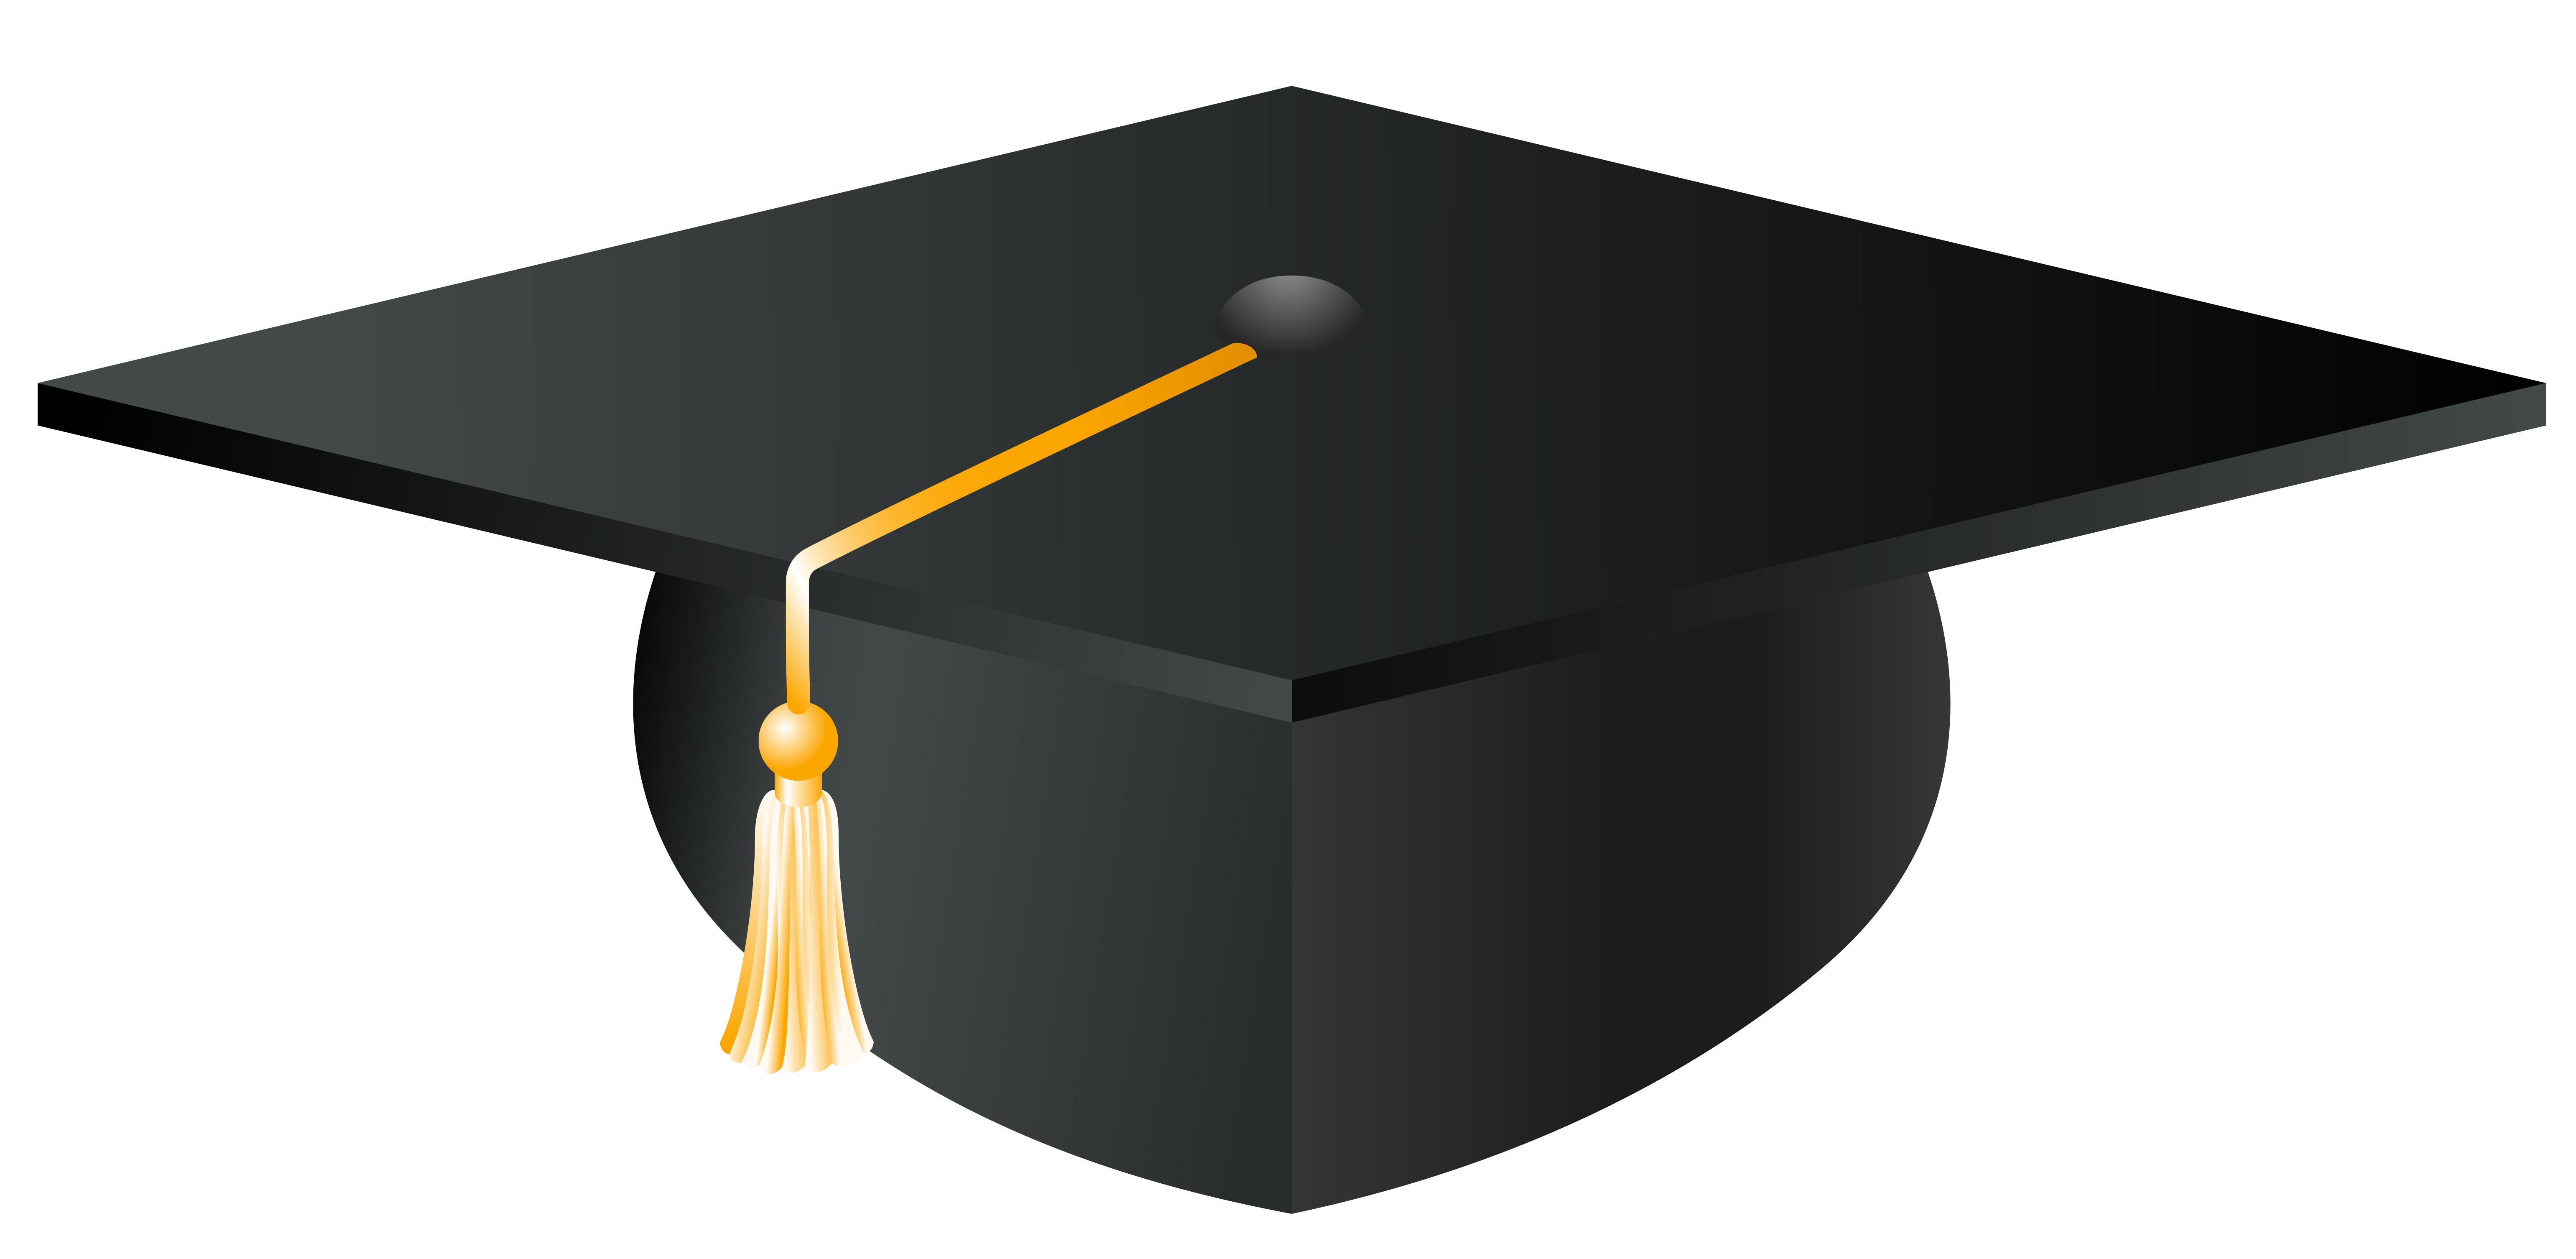 Graduation Cap Drawings Free Download Best Graduation